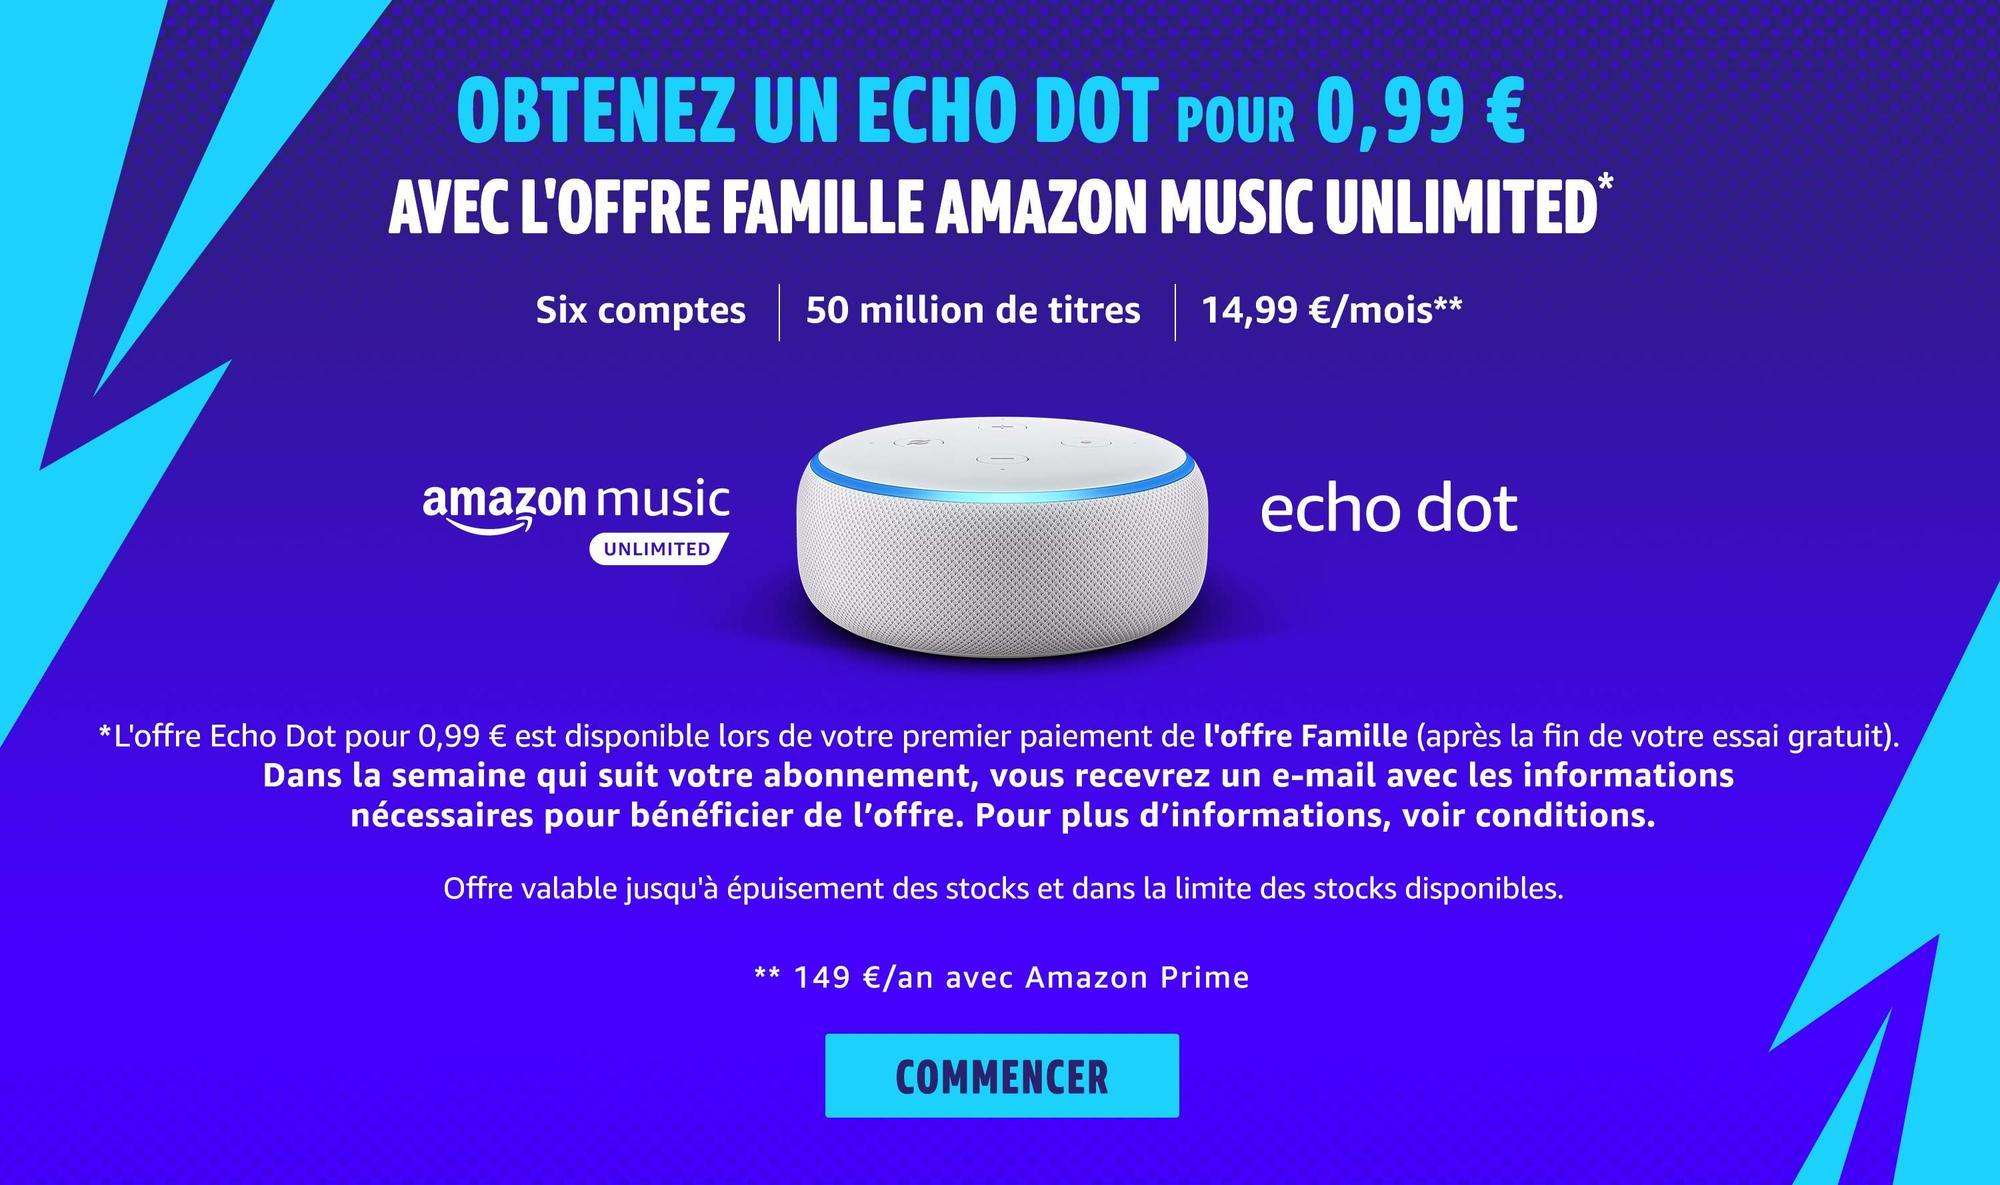 Amazon Echo Dot - Amazon Music Unlimited